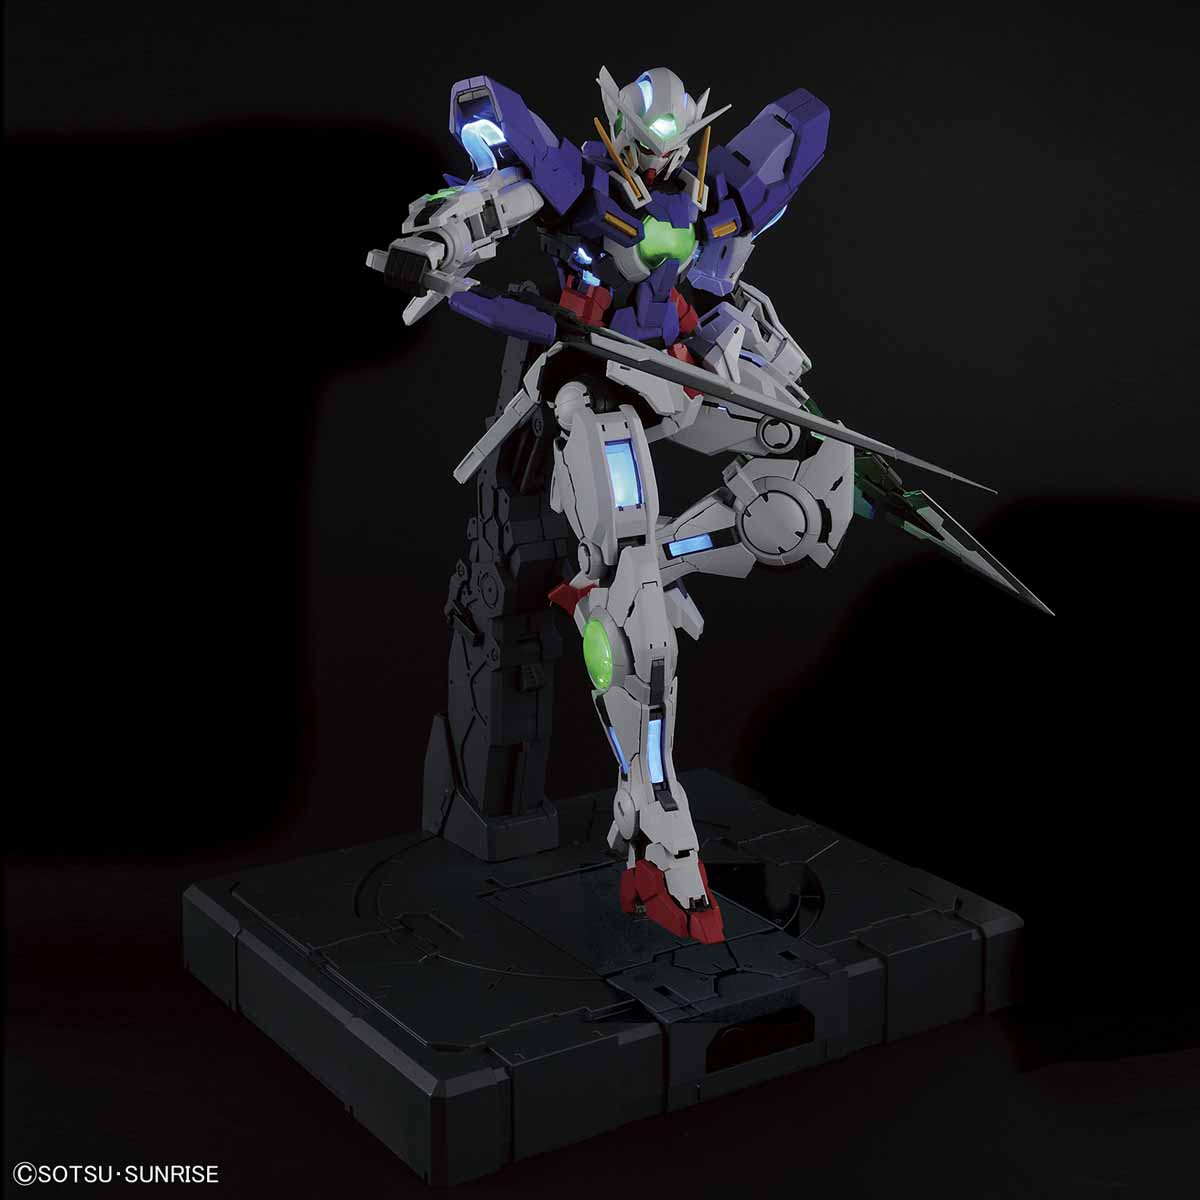 57933PG 1/60 GN-001 ガンダムエクシア(LIGHTING MODEL) [Gundam Exia (Lighting Model)]